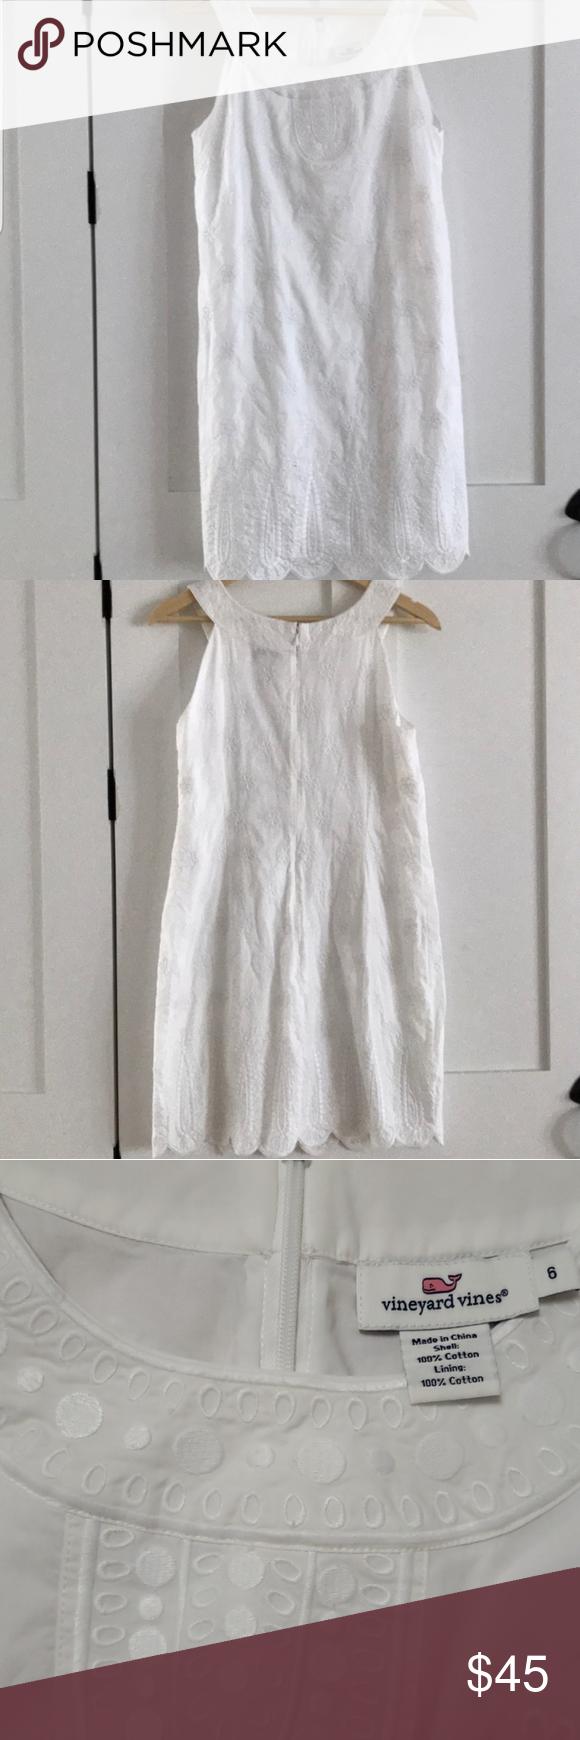 Vineyard Vines Embroided White Dress Size 6 White Dress Dresses Clothes Design [ 1740 x 580 Pixel ]